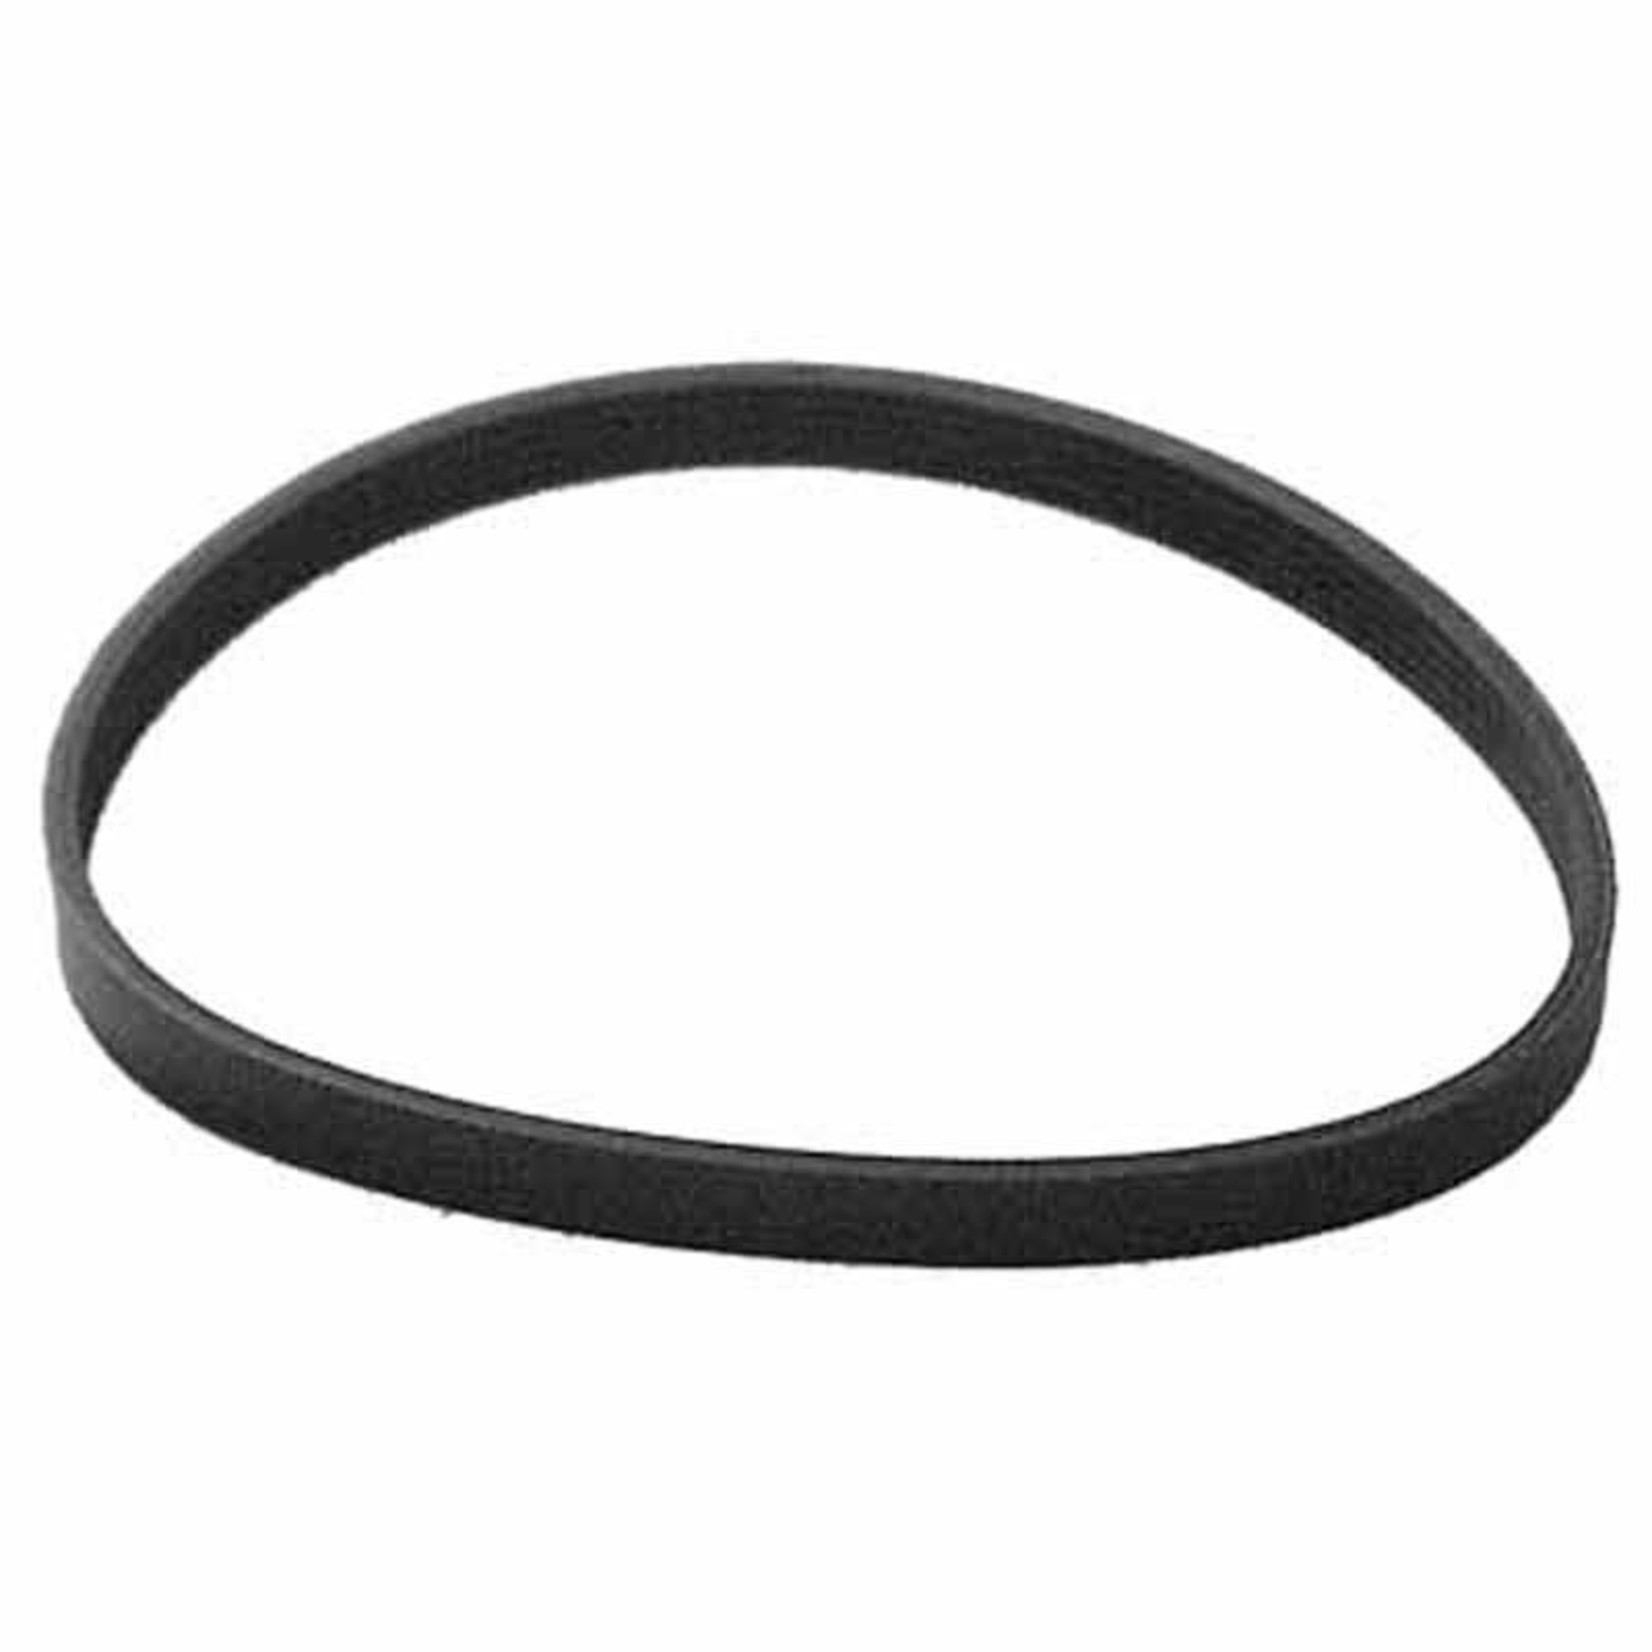 Centec Centec & Kenmore Serpentine Belt, Style 20-5201